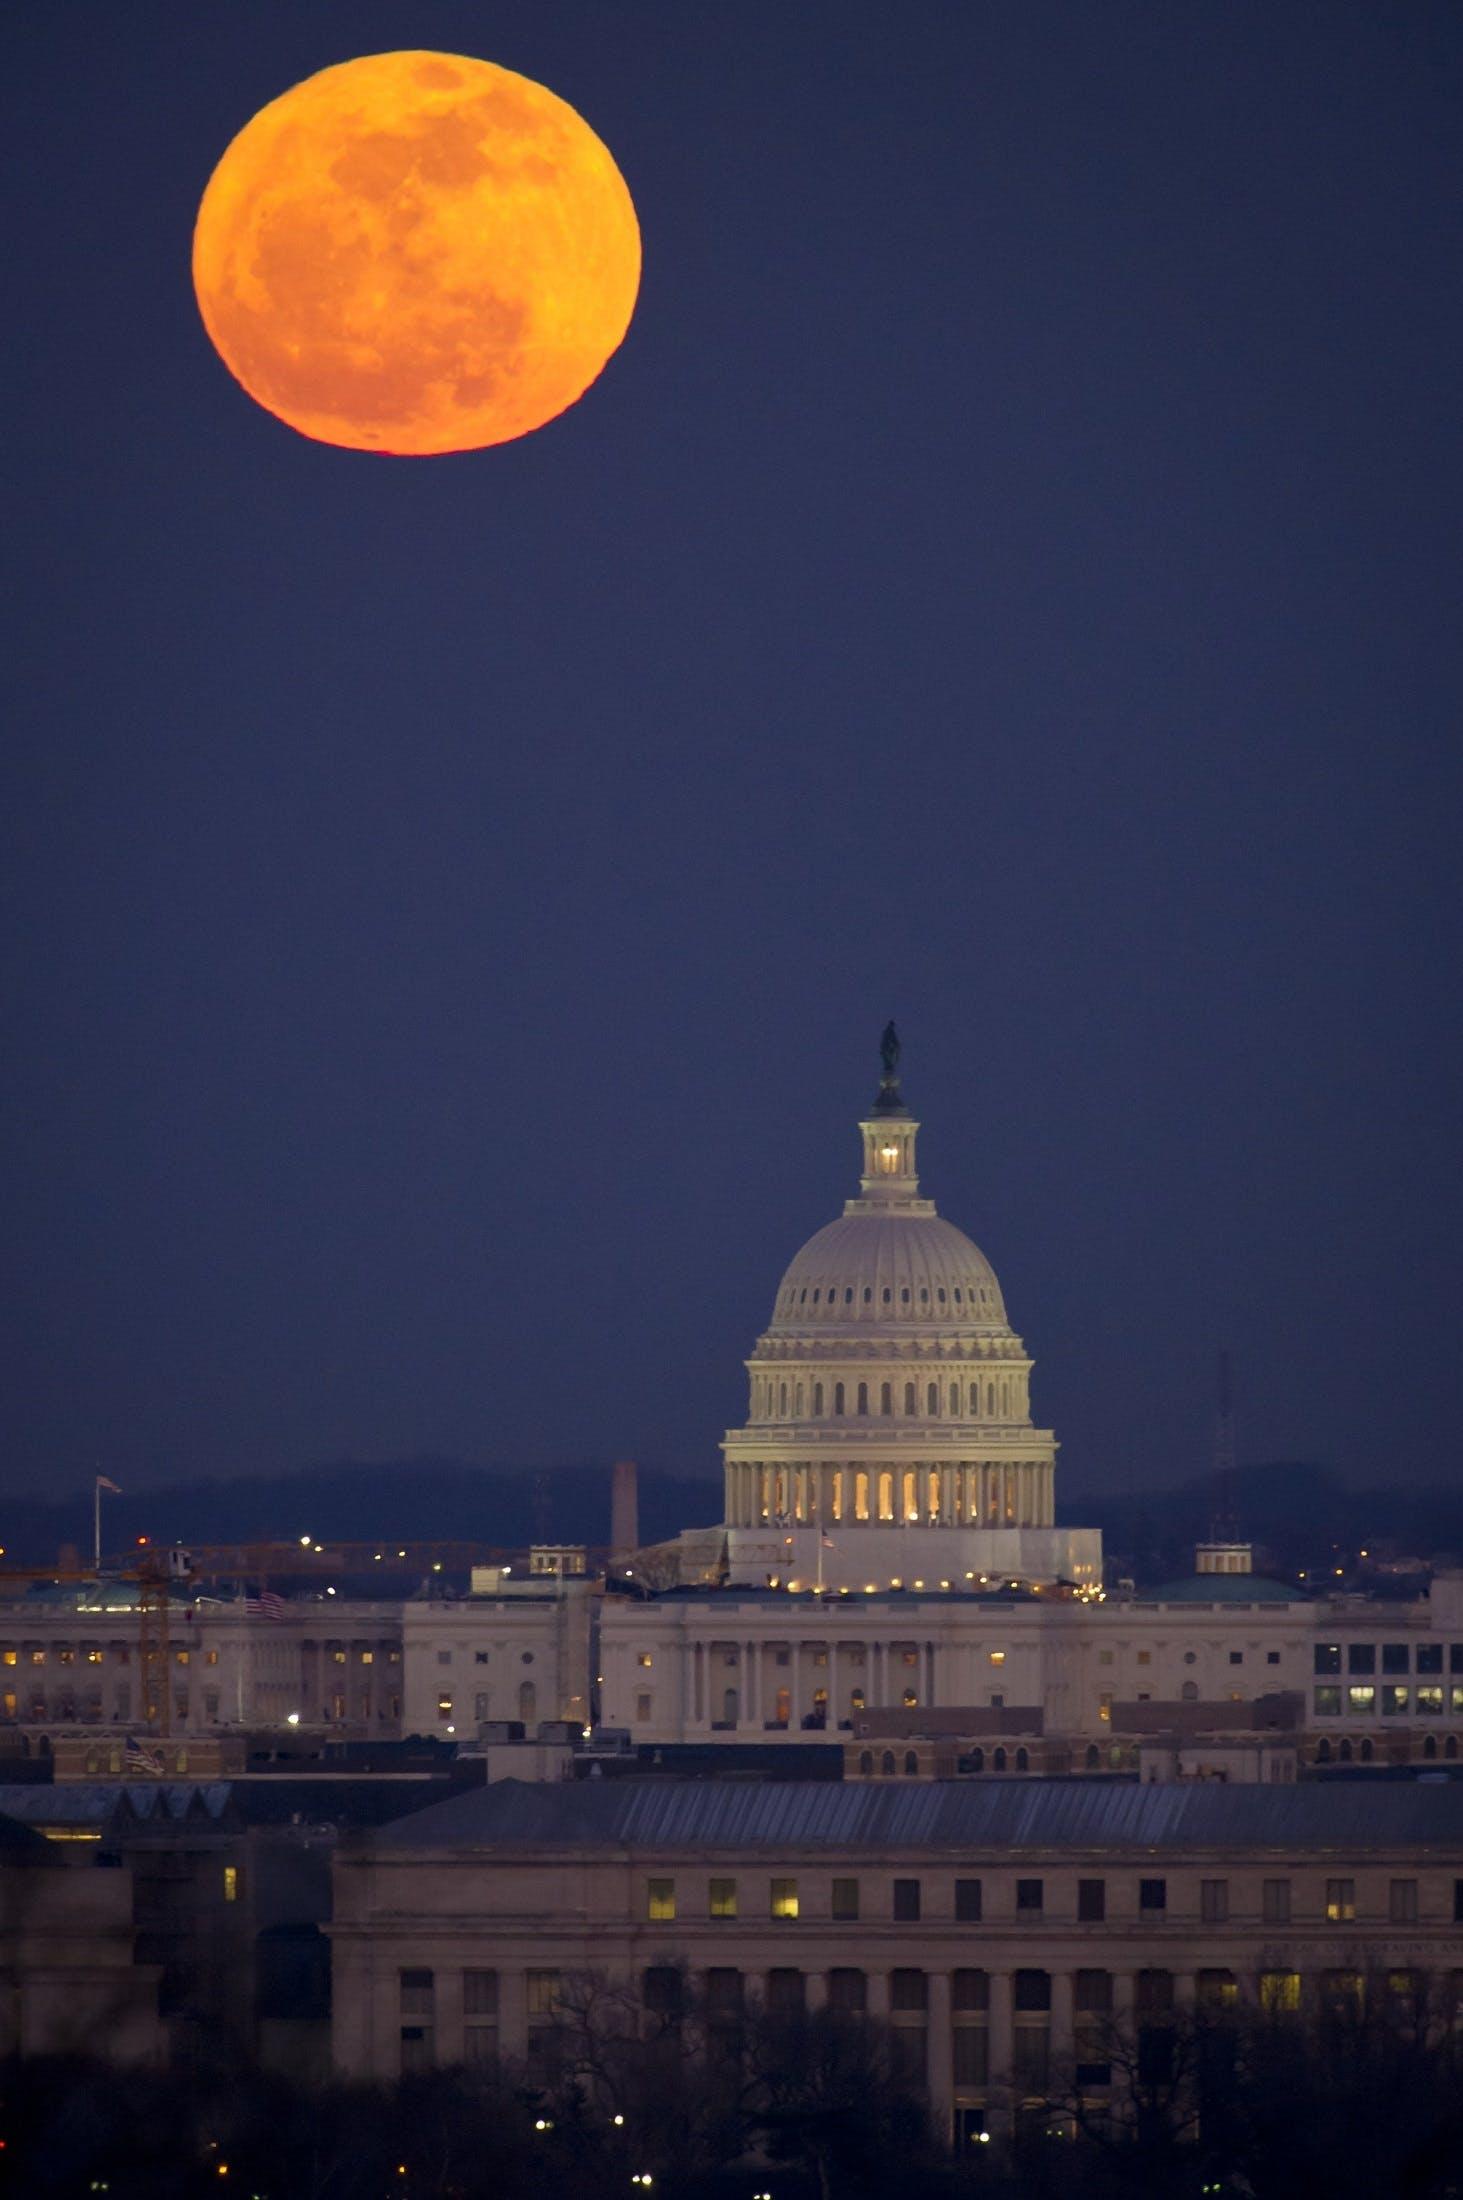 Full Moon on Capitol Hill Washington